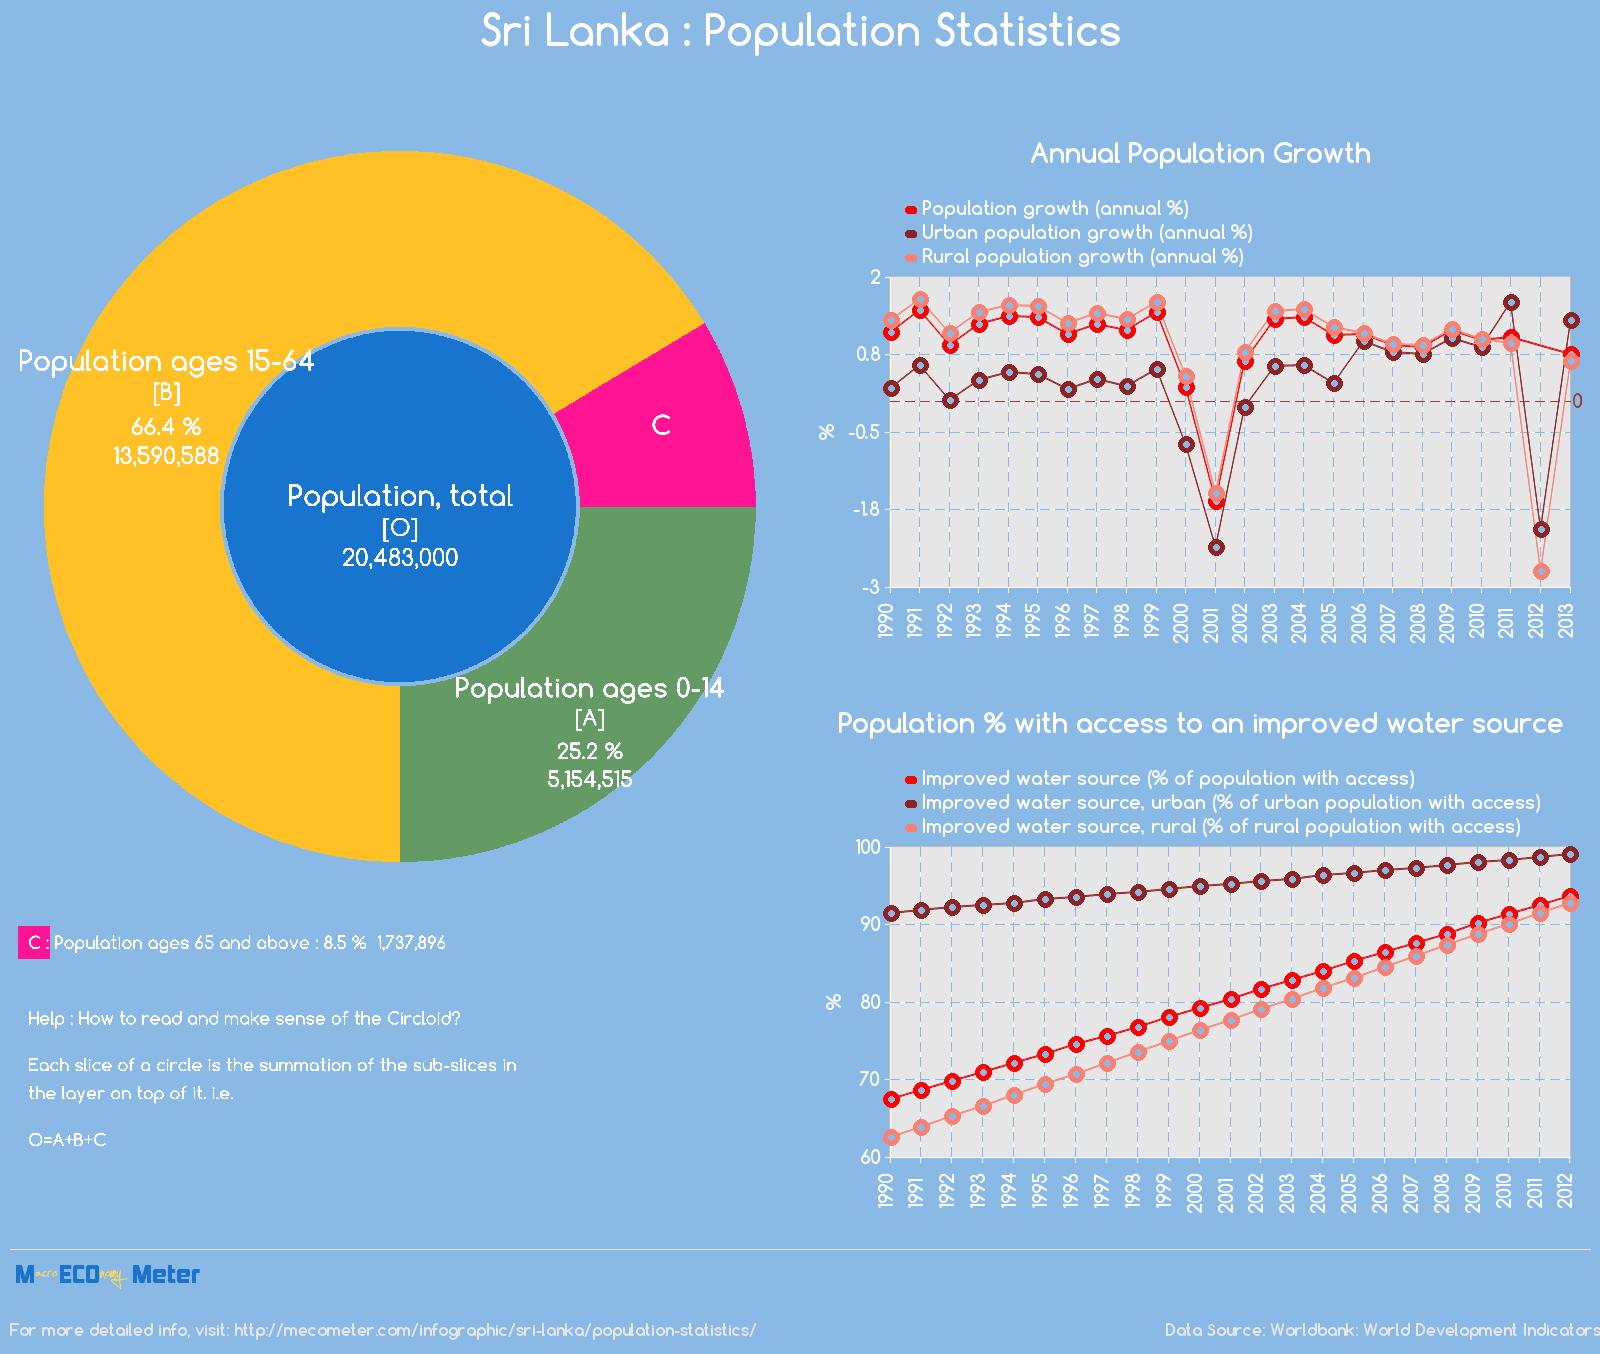 Sri Lanka : Population Statistics